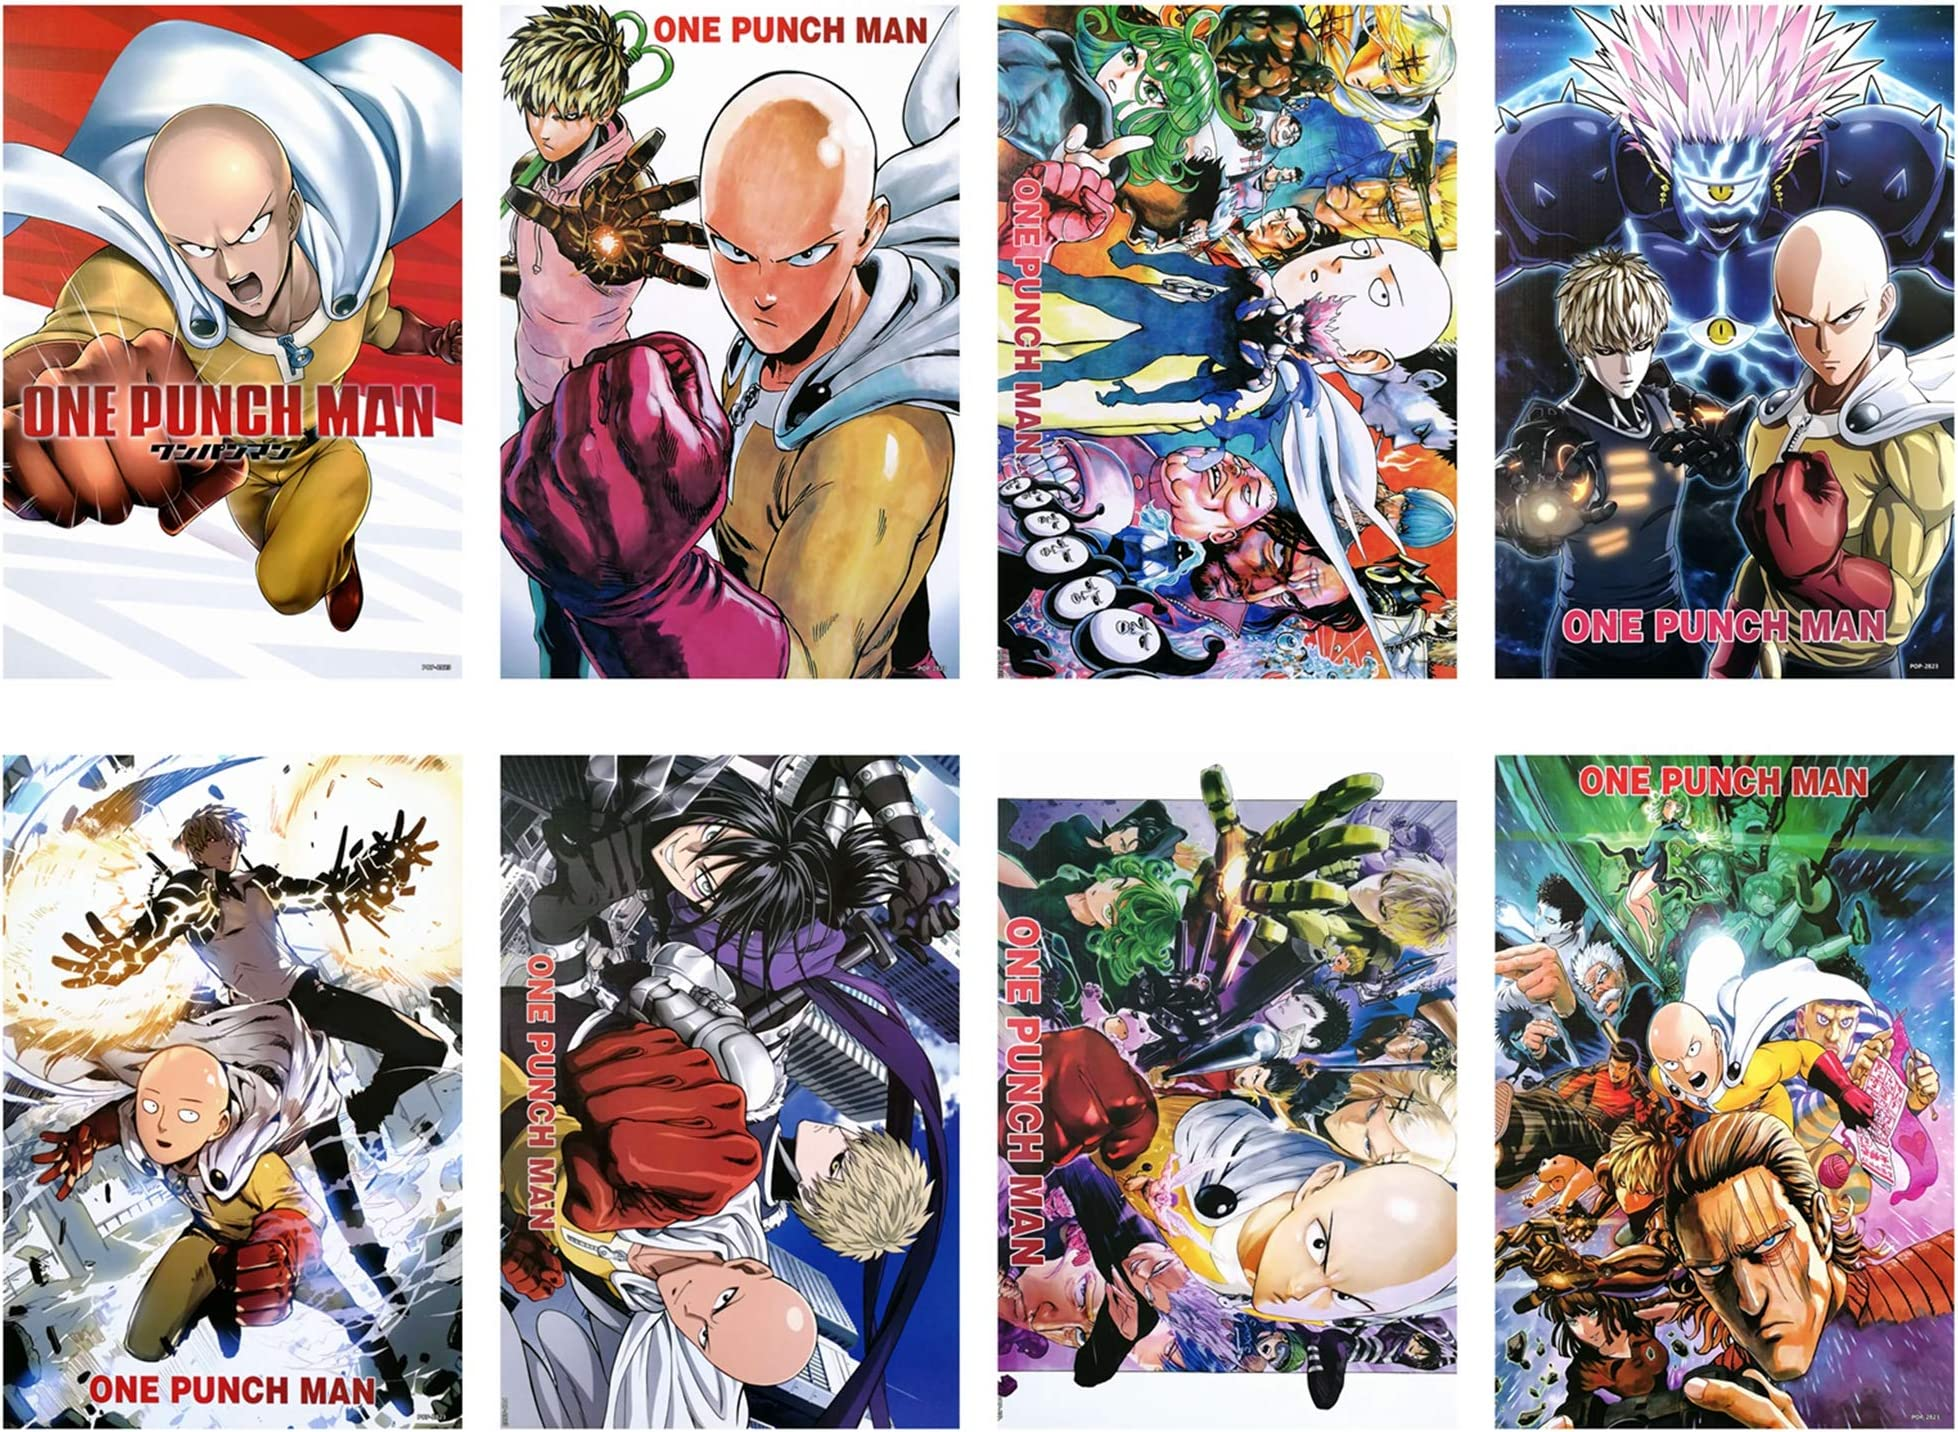 One Punch Man Anime Manga Large Poster Art Print Gift A0 A1 A2 A3 A4 Maxi